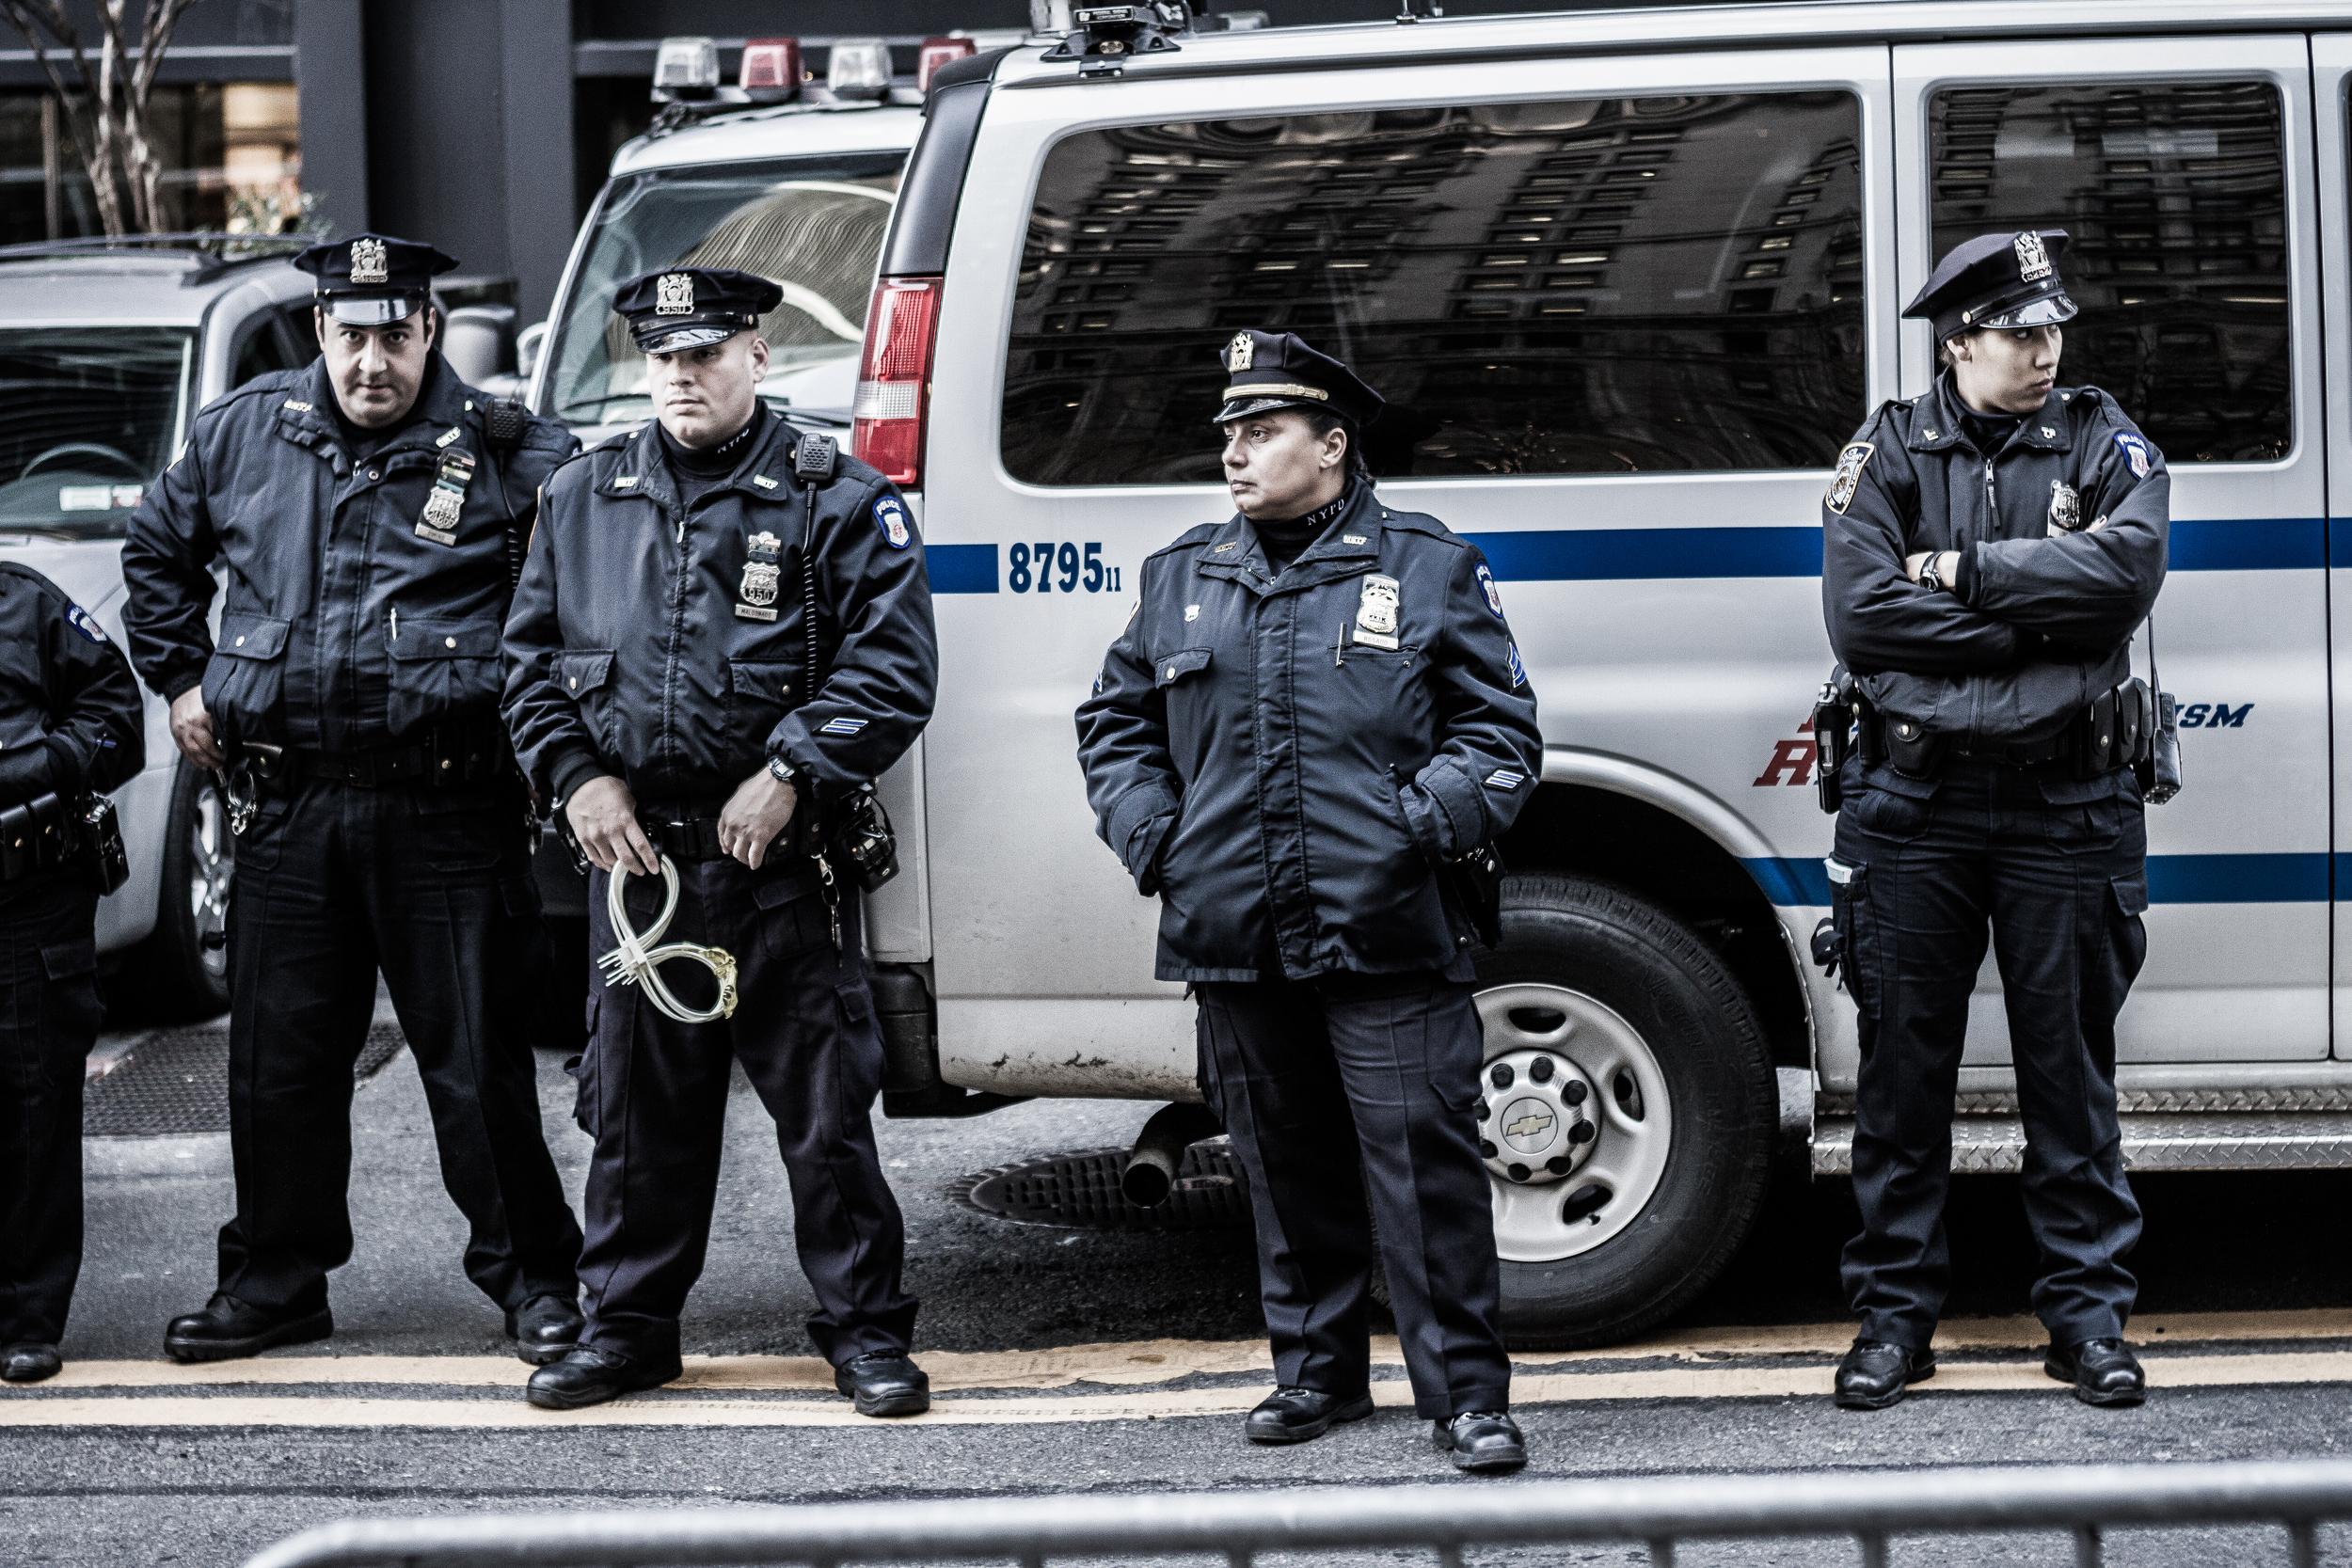 NYC-FiDi-ZucottiPark-4CopsandVan-11-25-11-1.jpg